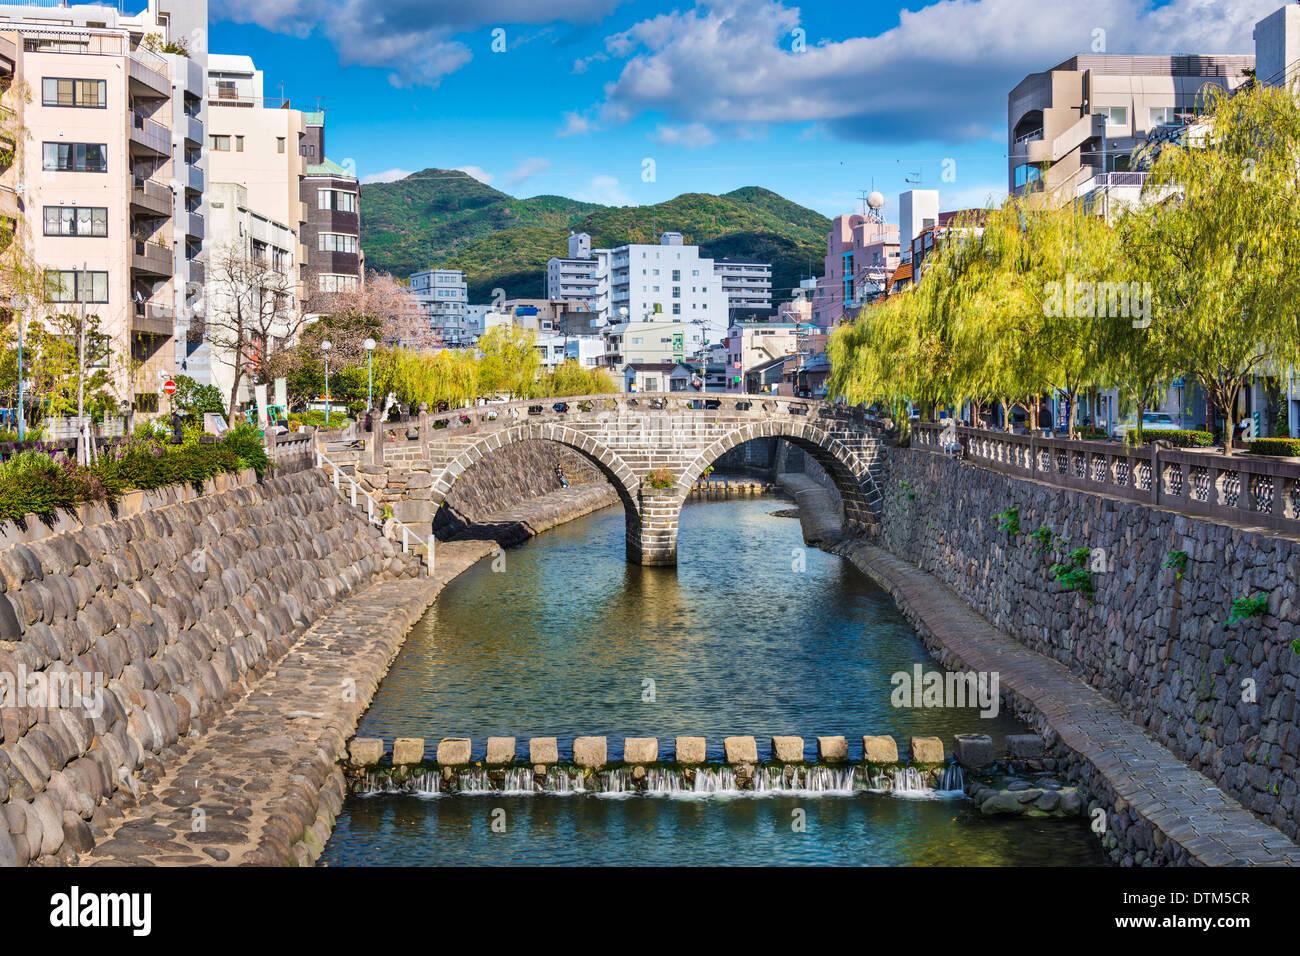 Nagasaki, Japan at historic Megane 'Spectacles' Bridge over the Nakashima River. - Stock Image